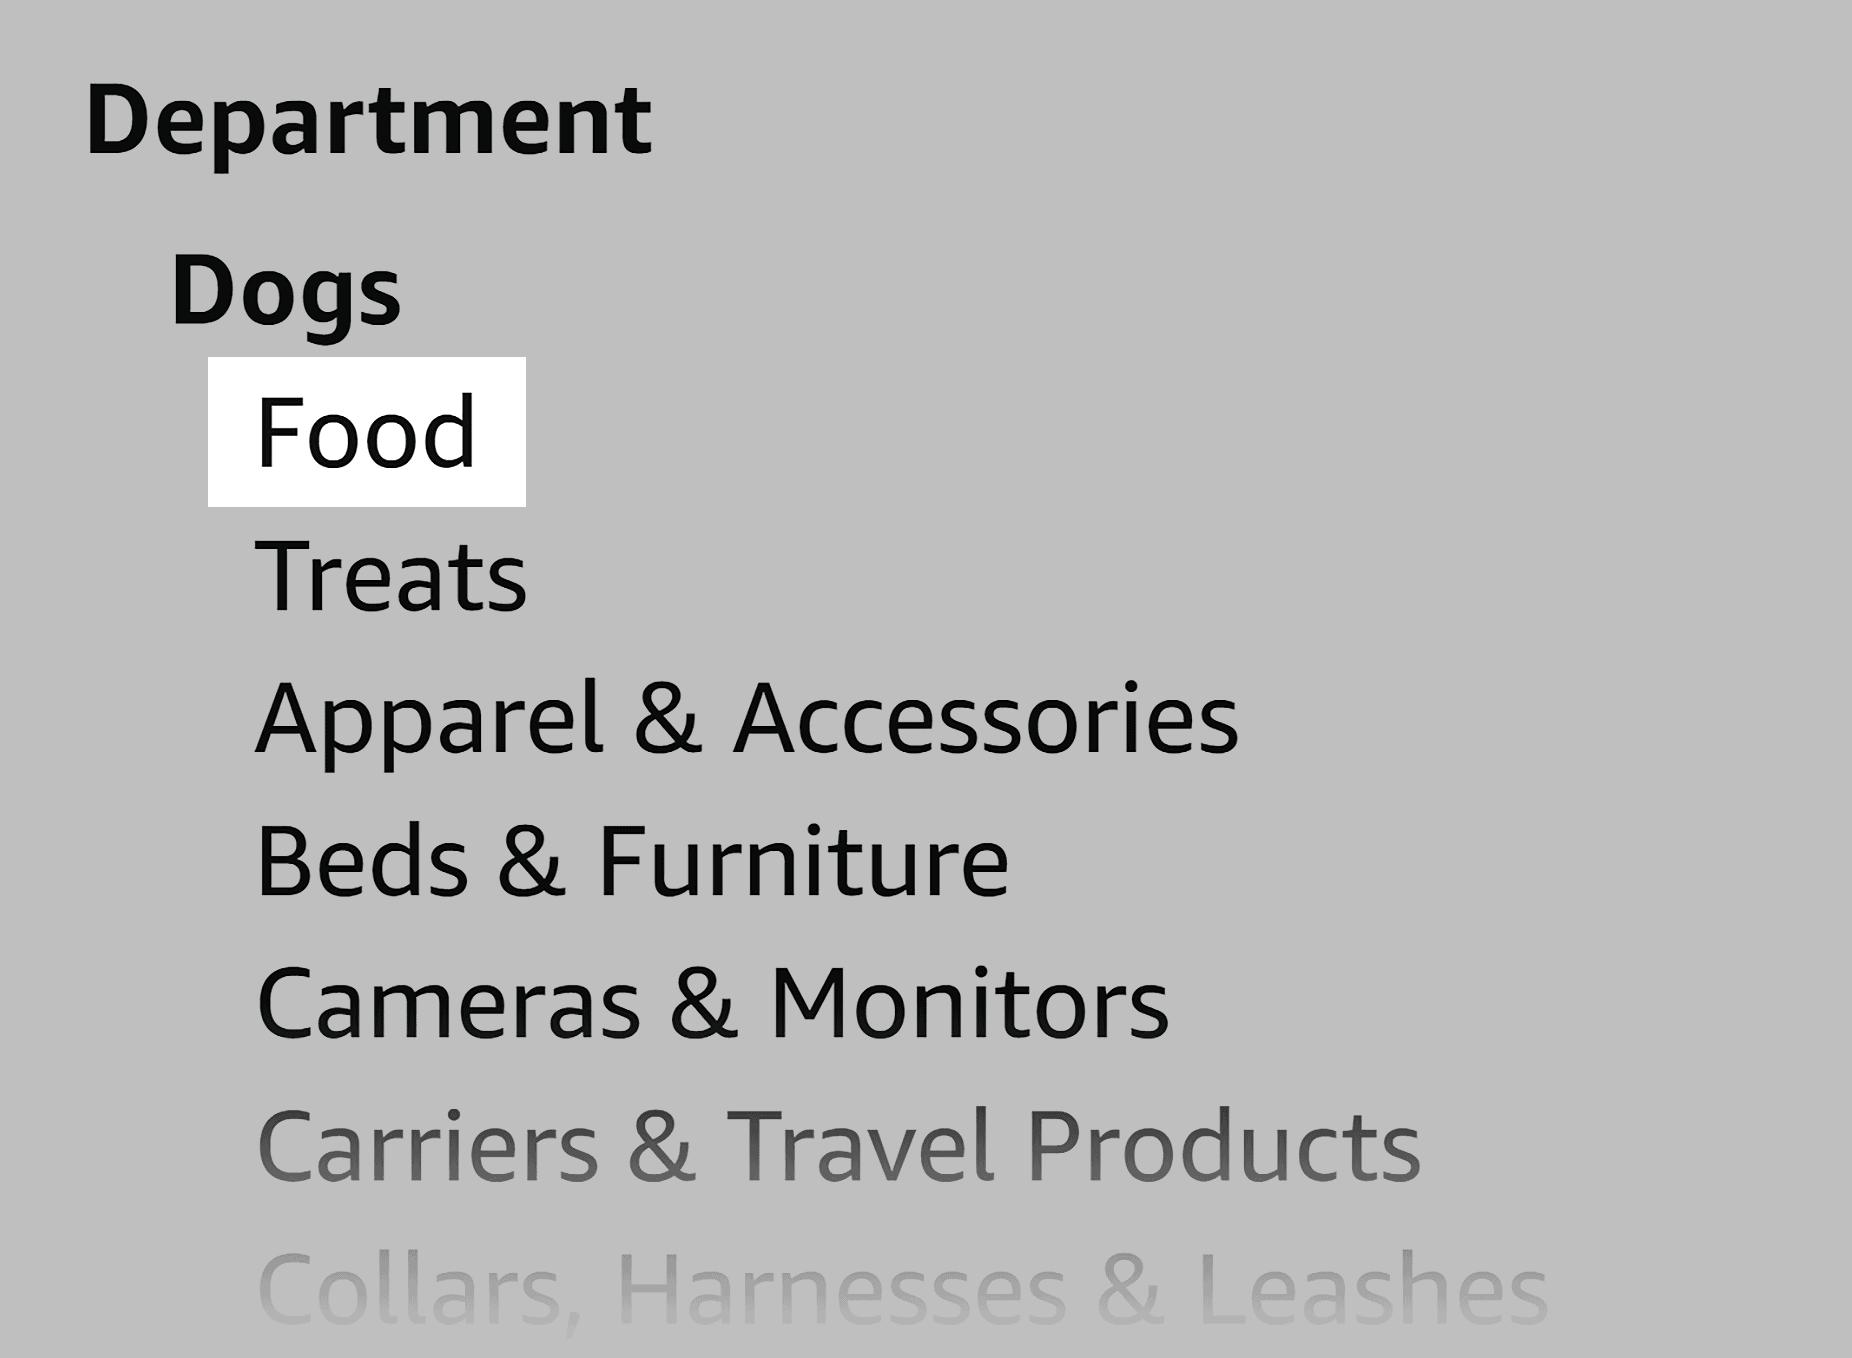 Amazon – Dogs department